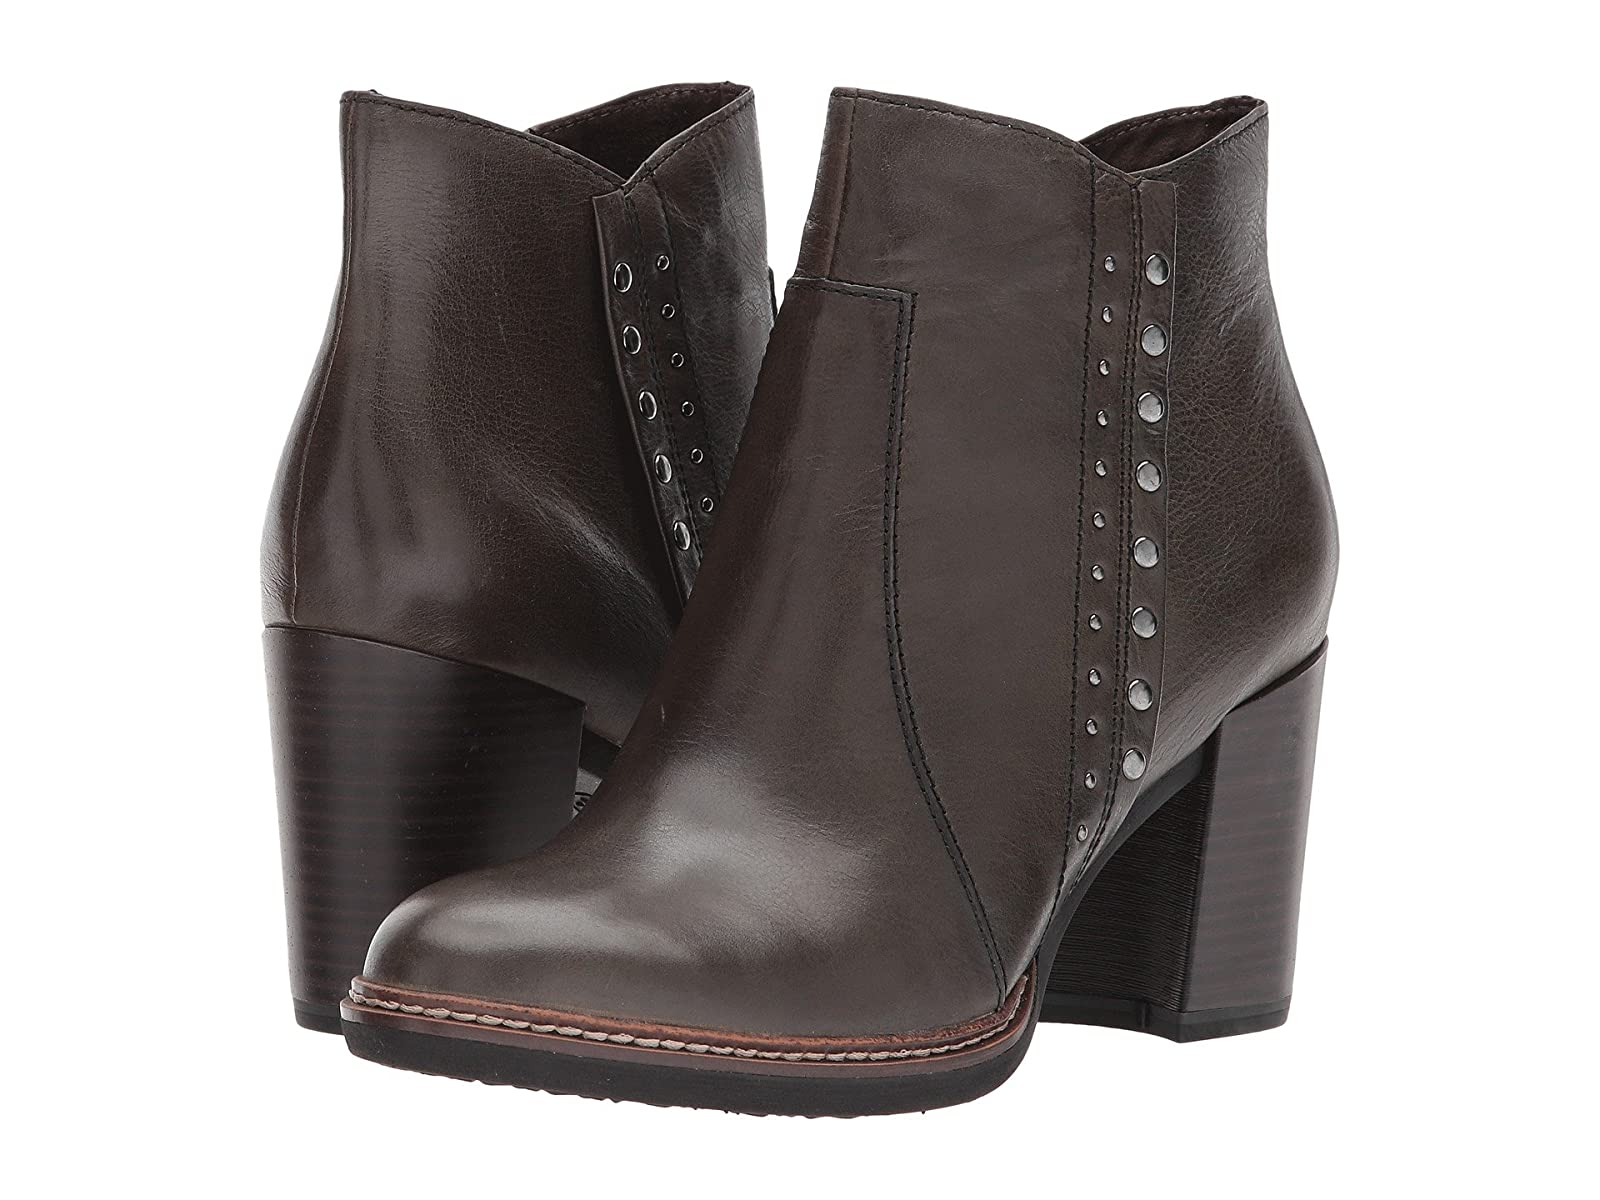 Tamaris Joly 1-1-25350-29Cheap and distinctive eye-catching shoes